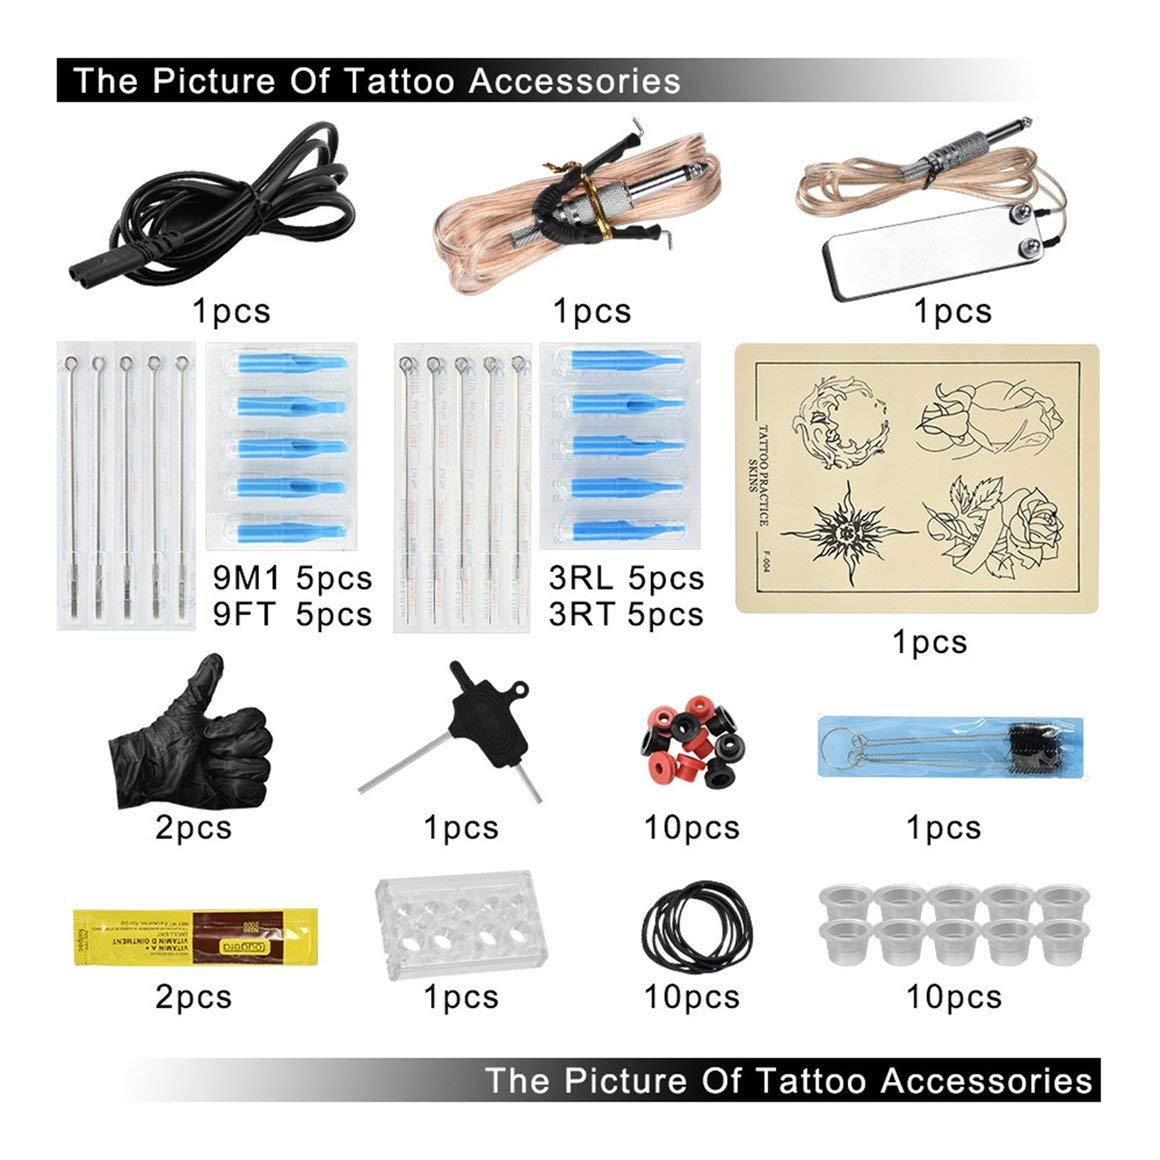 Funnyrunstore Juego de m/áquina Profesional de Tatuaje con cord/ón de Clip Pedal del pie Motor de Tatuaje Pistola rotativa Mini Fuente de alimentaci/ón Kit de Accesorios para Tatuaje Negro y Dorado